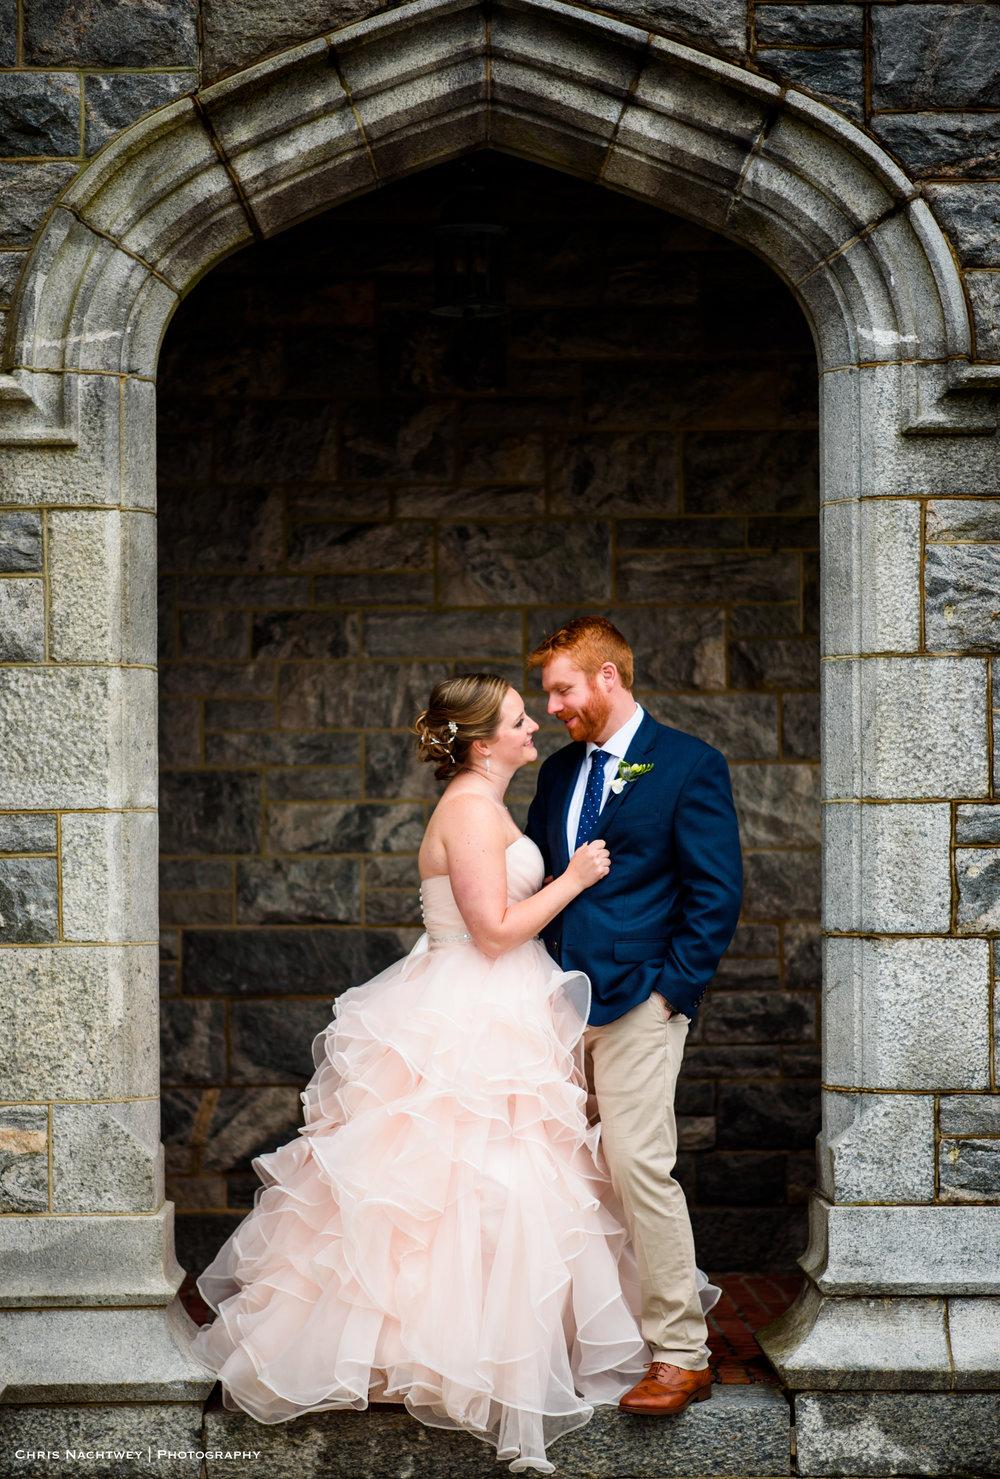 ct-wedding-photos-branford-house-groton-ct-chris-nachtwey-photography-2018-b-a-22.jpg